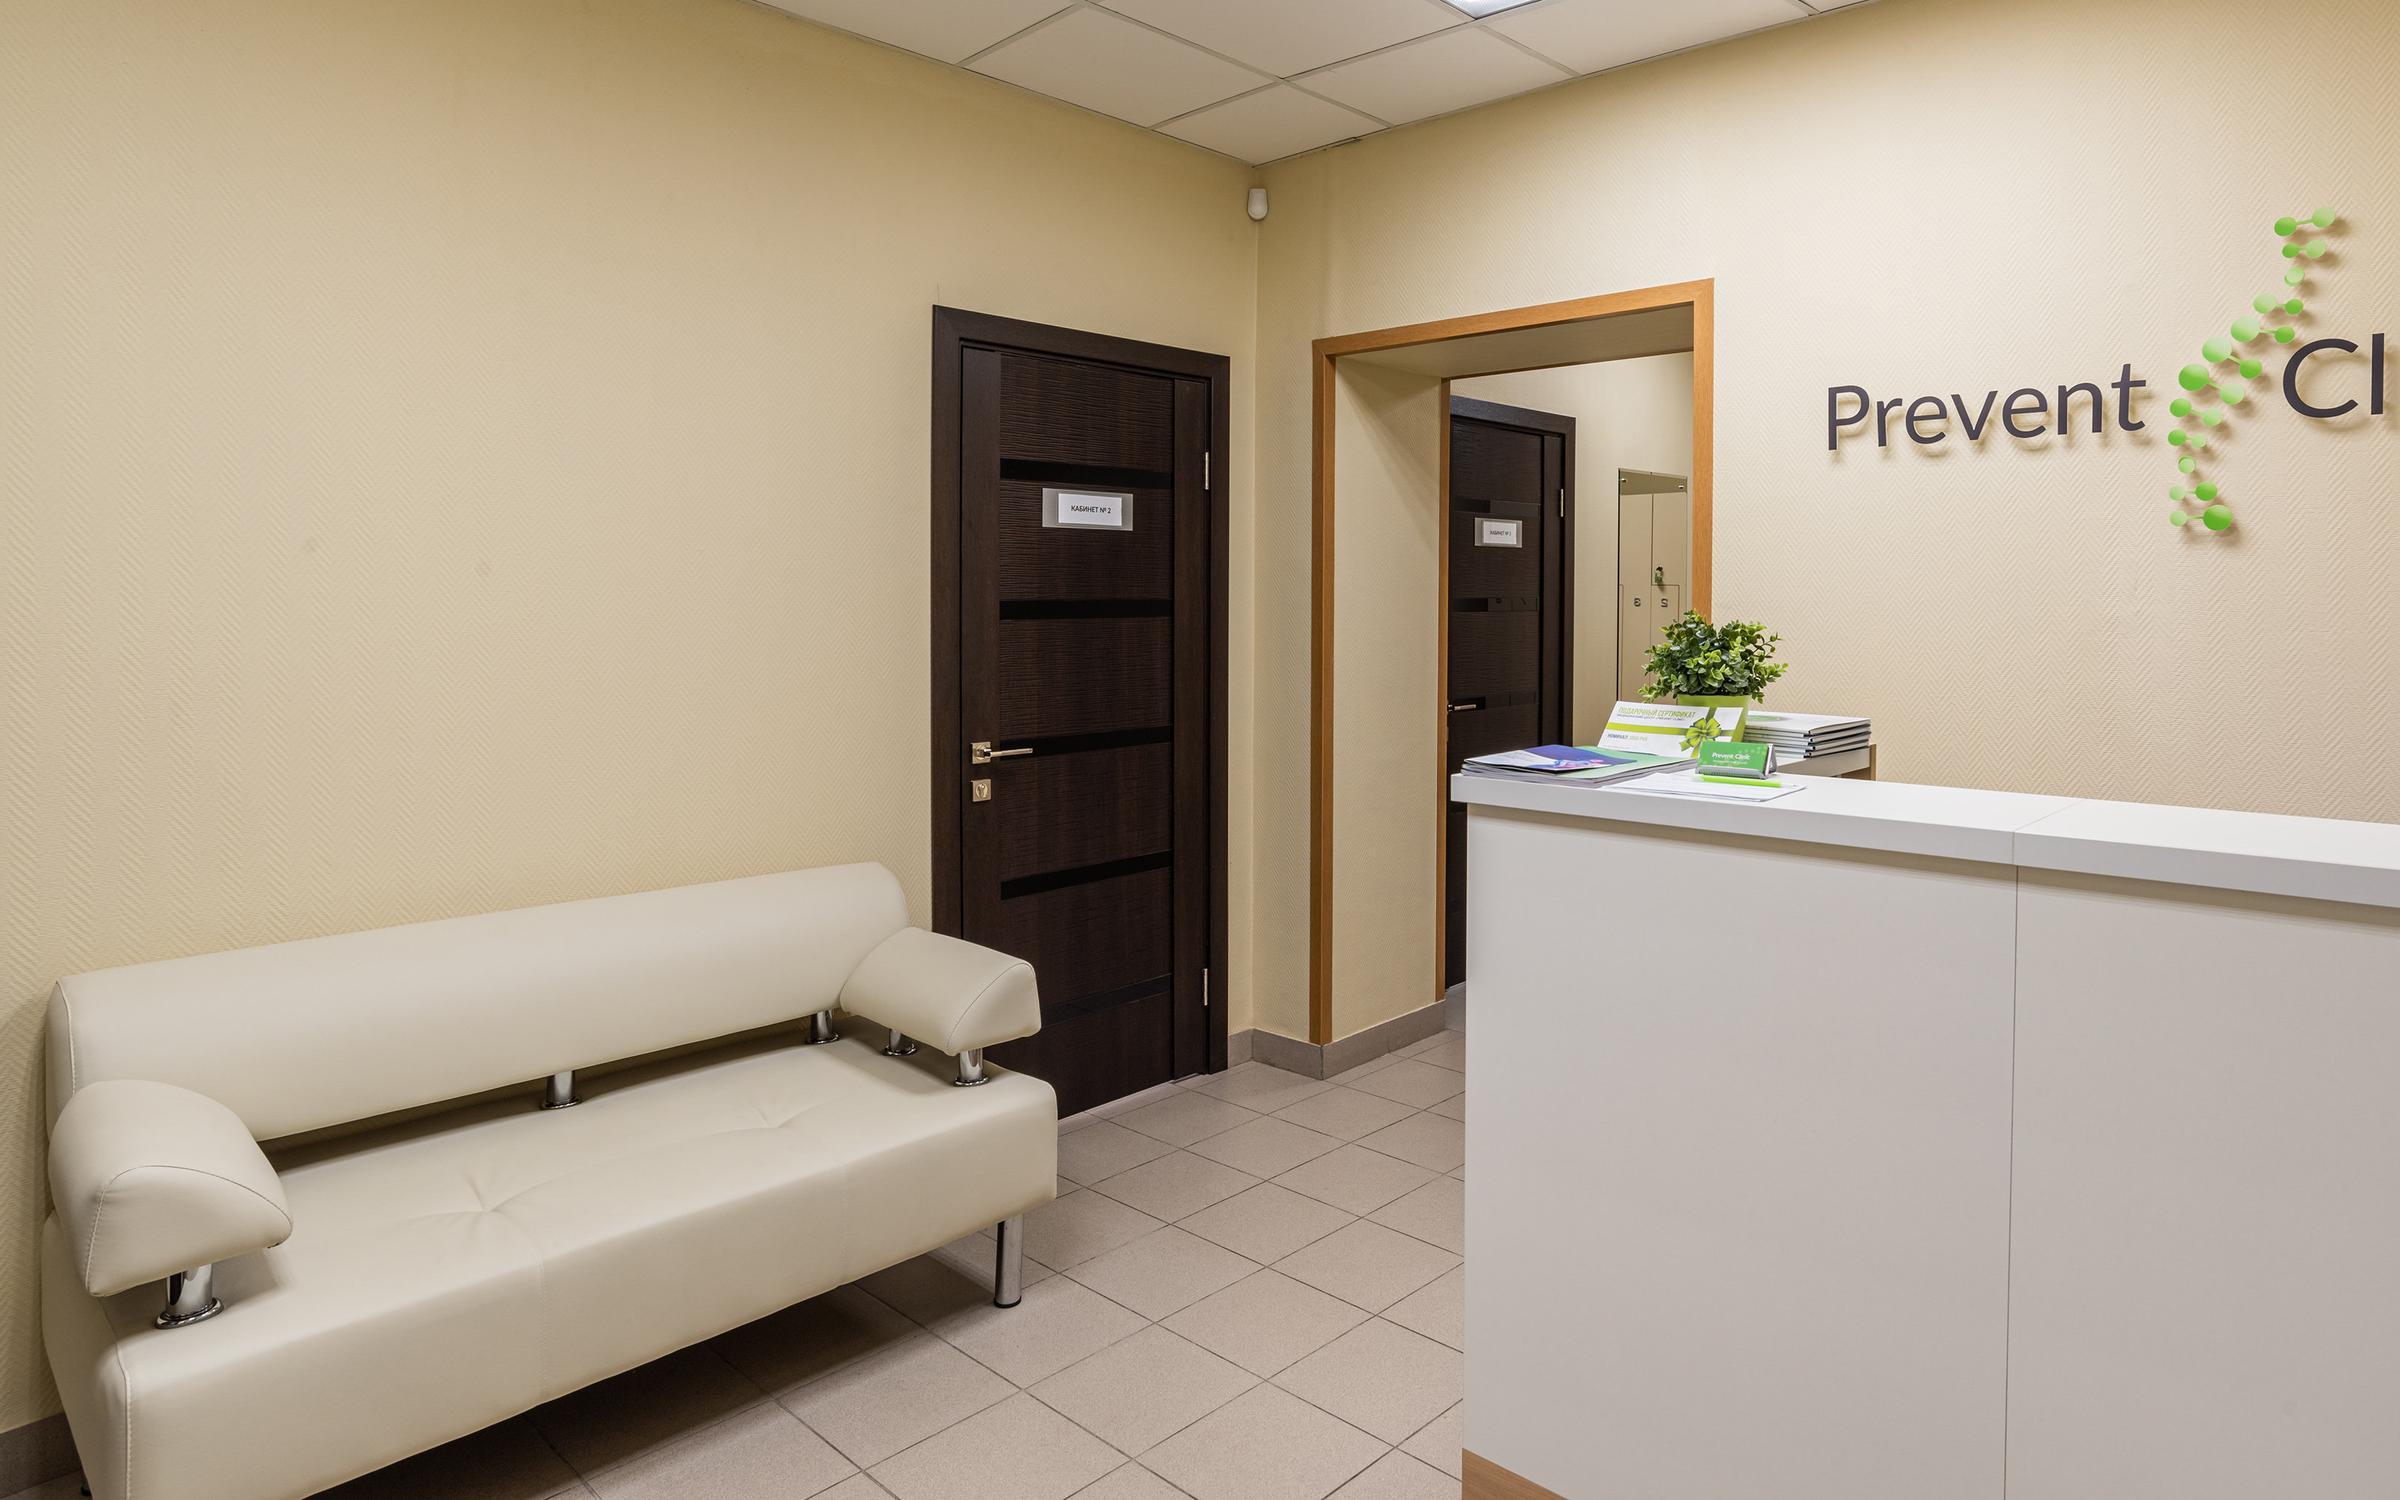 фотография Медицинского центра Prevent Clinic